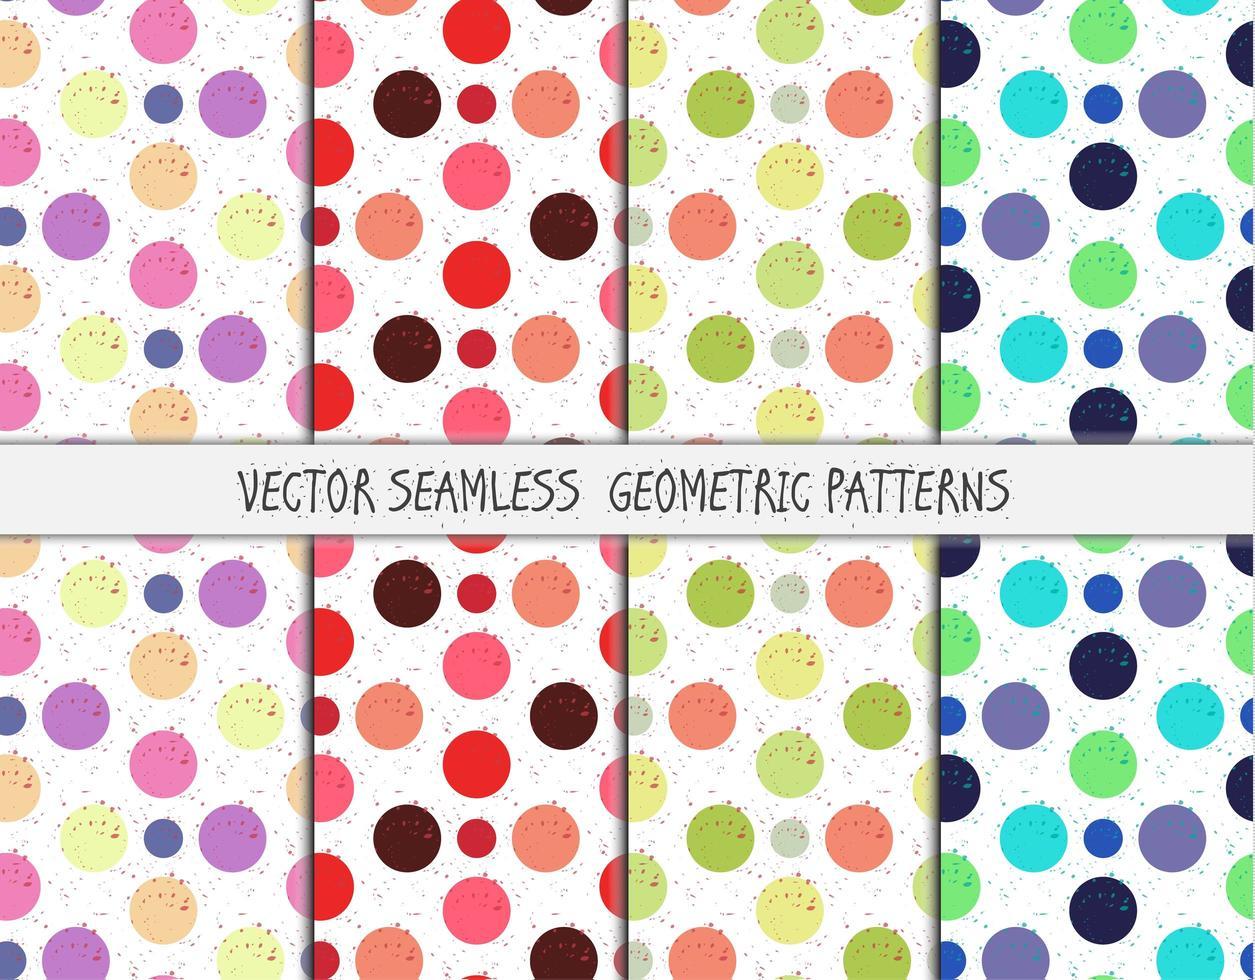 grunge färgglada geometriska sömlösa mönster set vektor